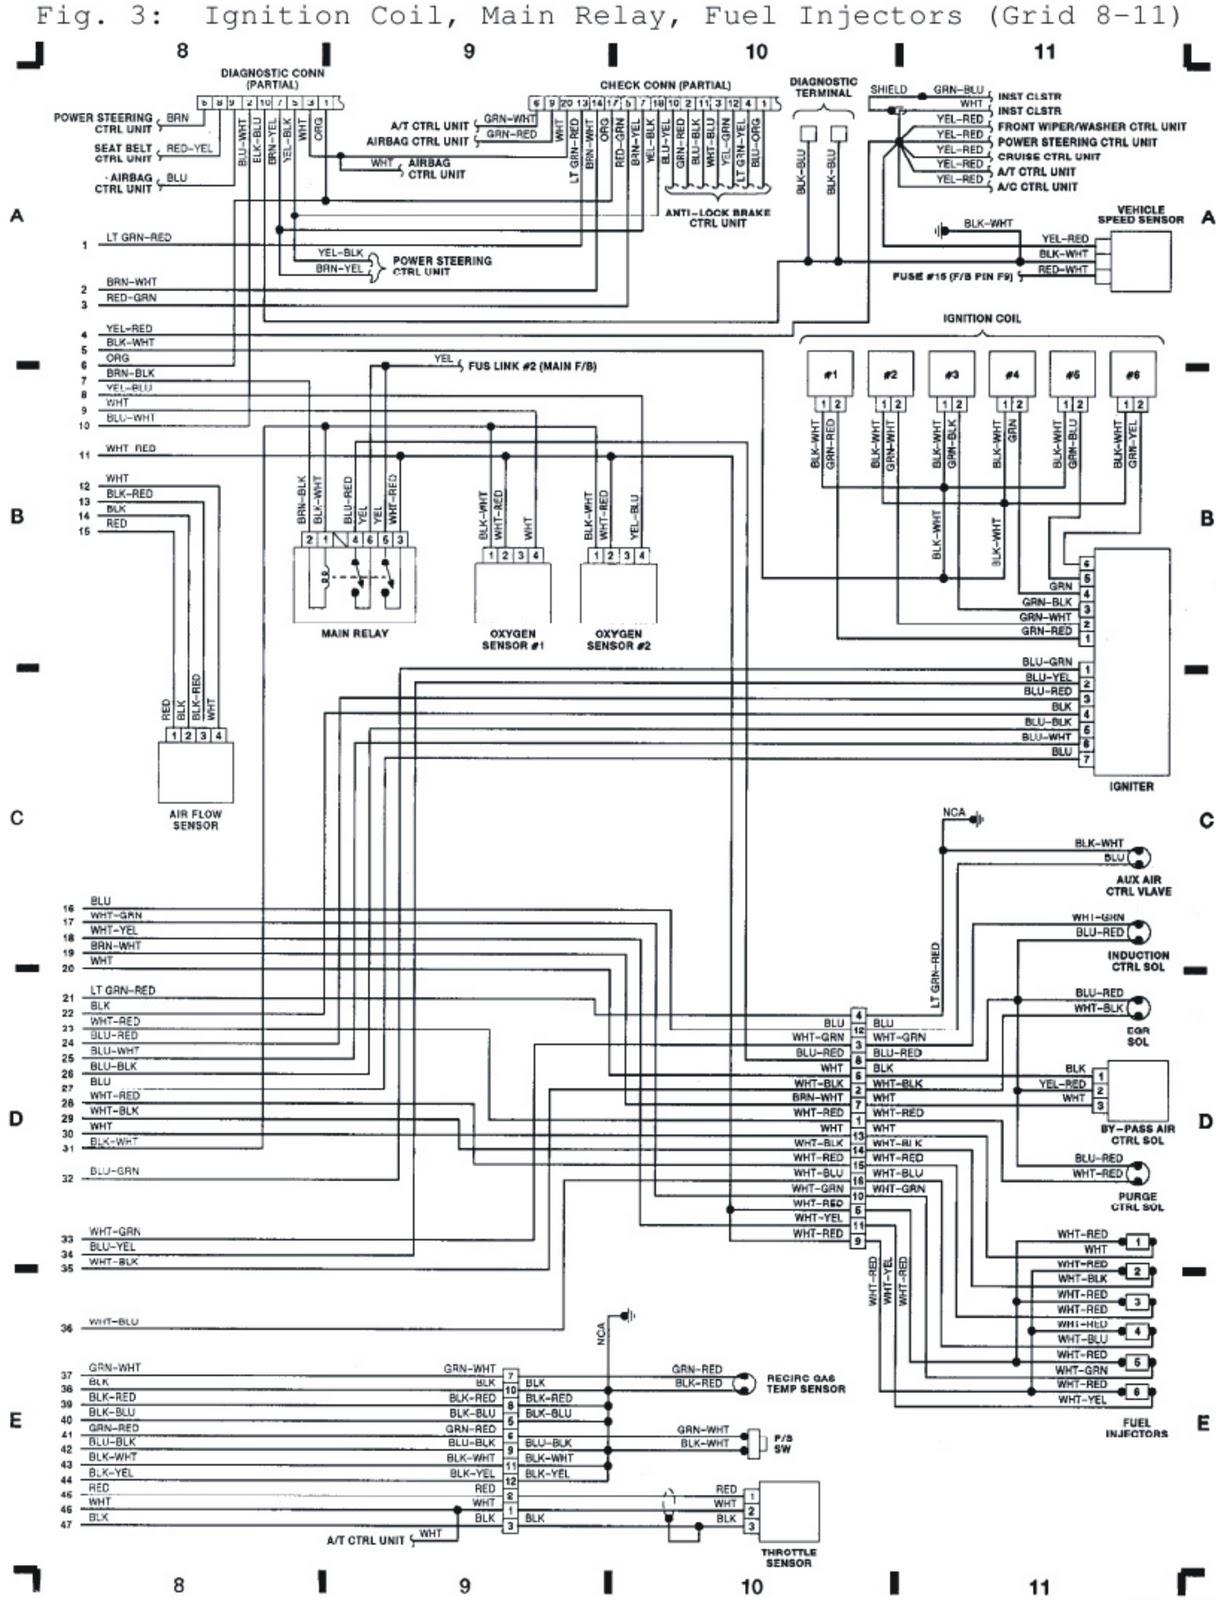 v manual 1992 subaru ignition coil main relay fuel injectors system1992 subaru ignition coil main relay [ 1216 x 1600 Pixel ]